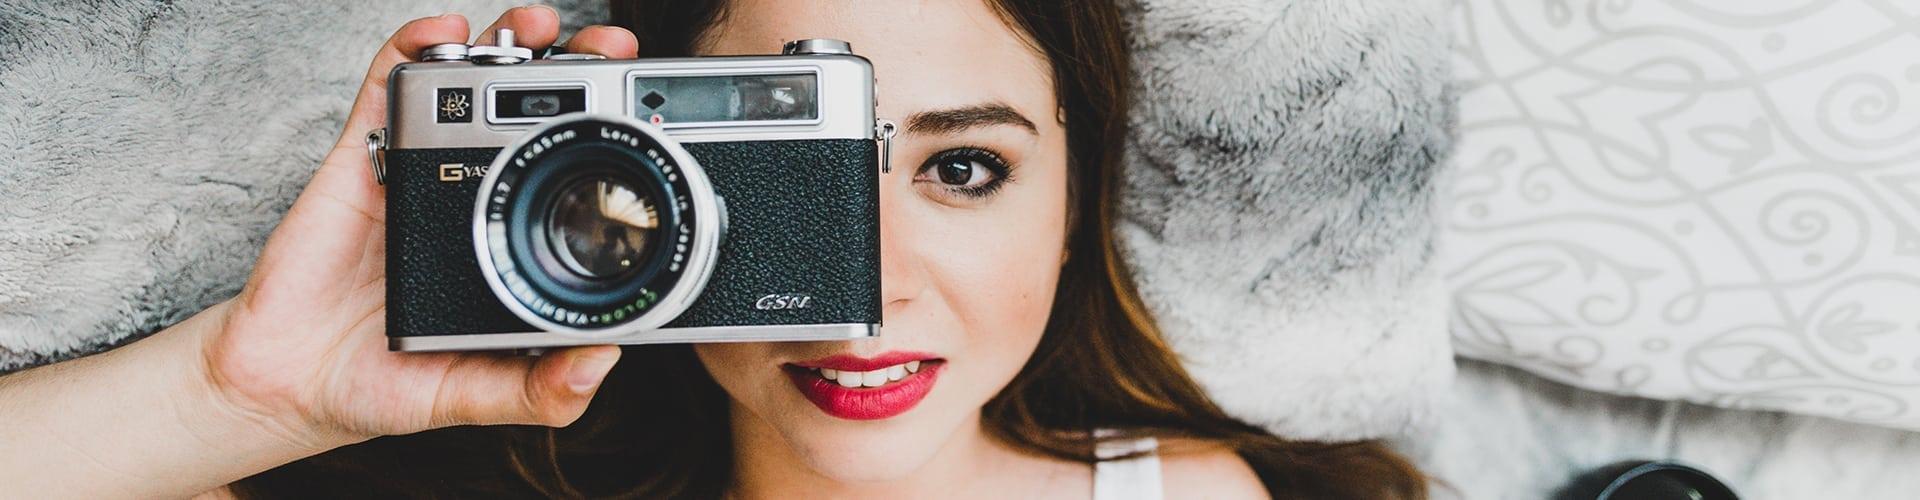 Tu ojo experto archivos - Voilà by Afflelou – Blog de oftalmología ... 10d631fd6518